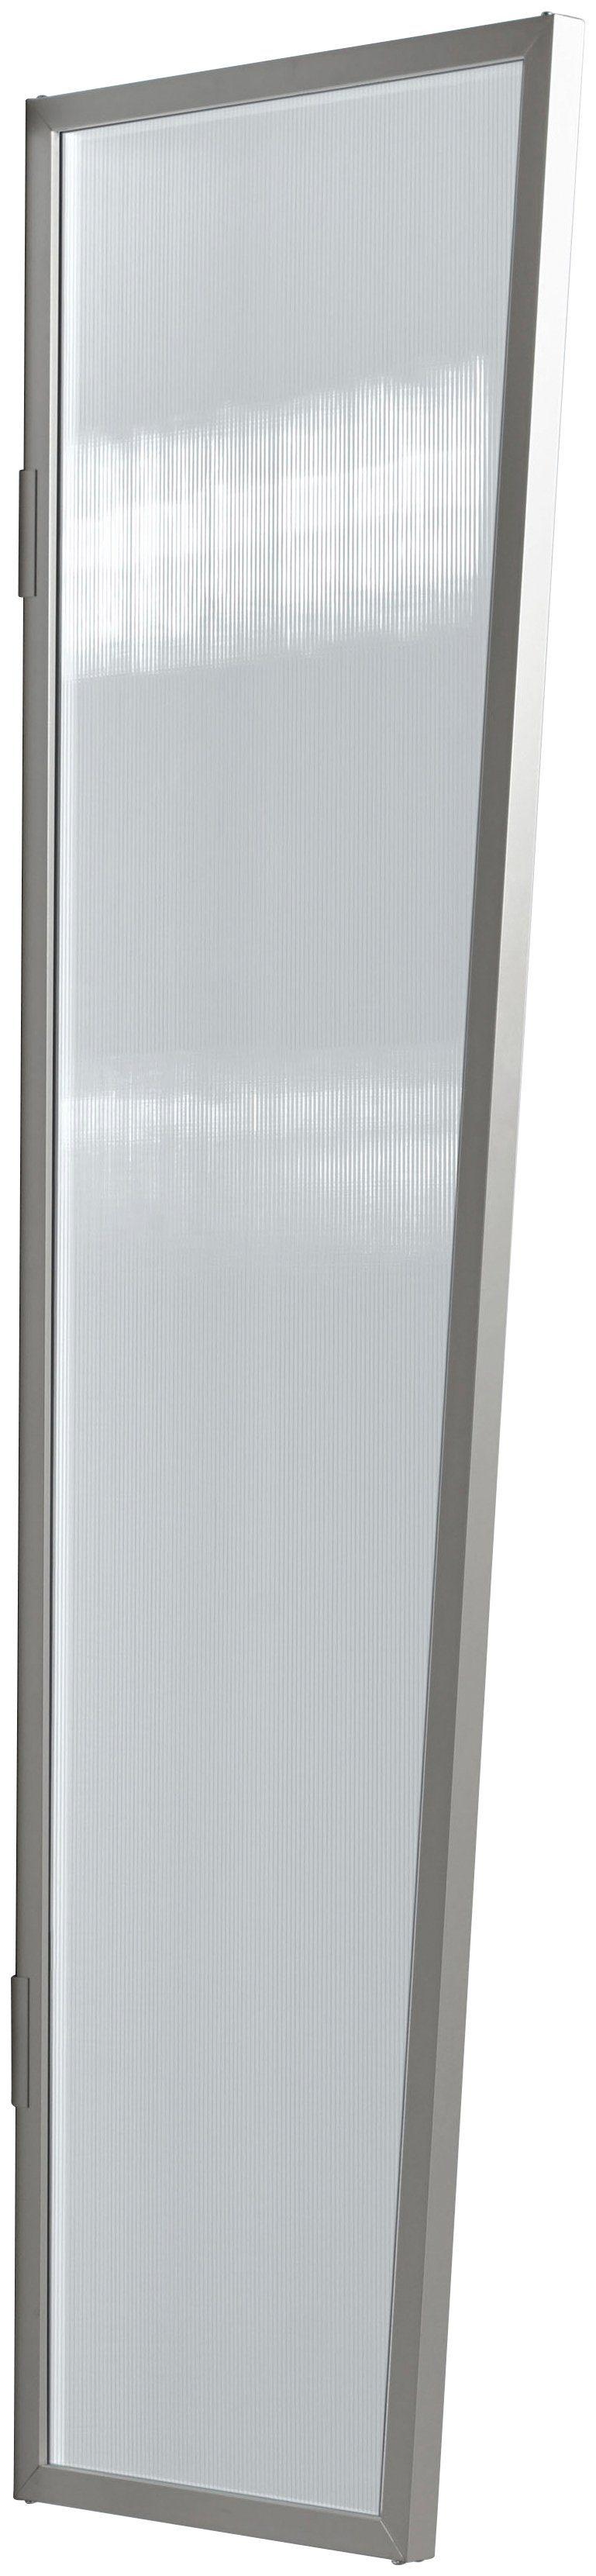 Seitenblende »B1 PC klar«, BxH: 60x200 cm, silberfarben/transparent